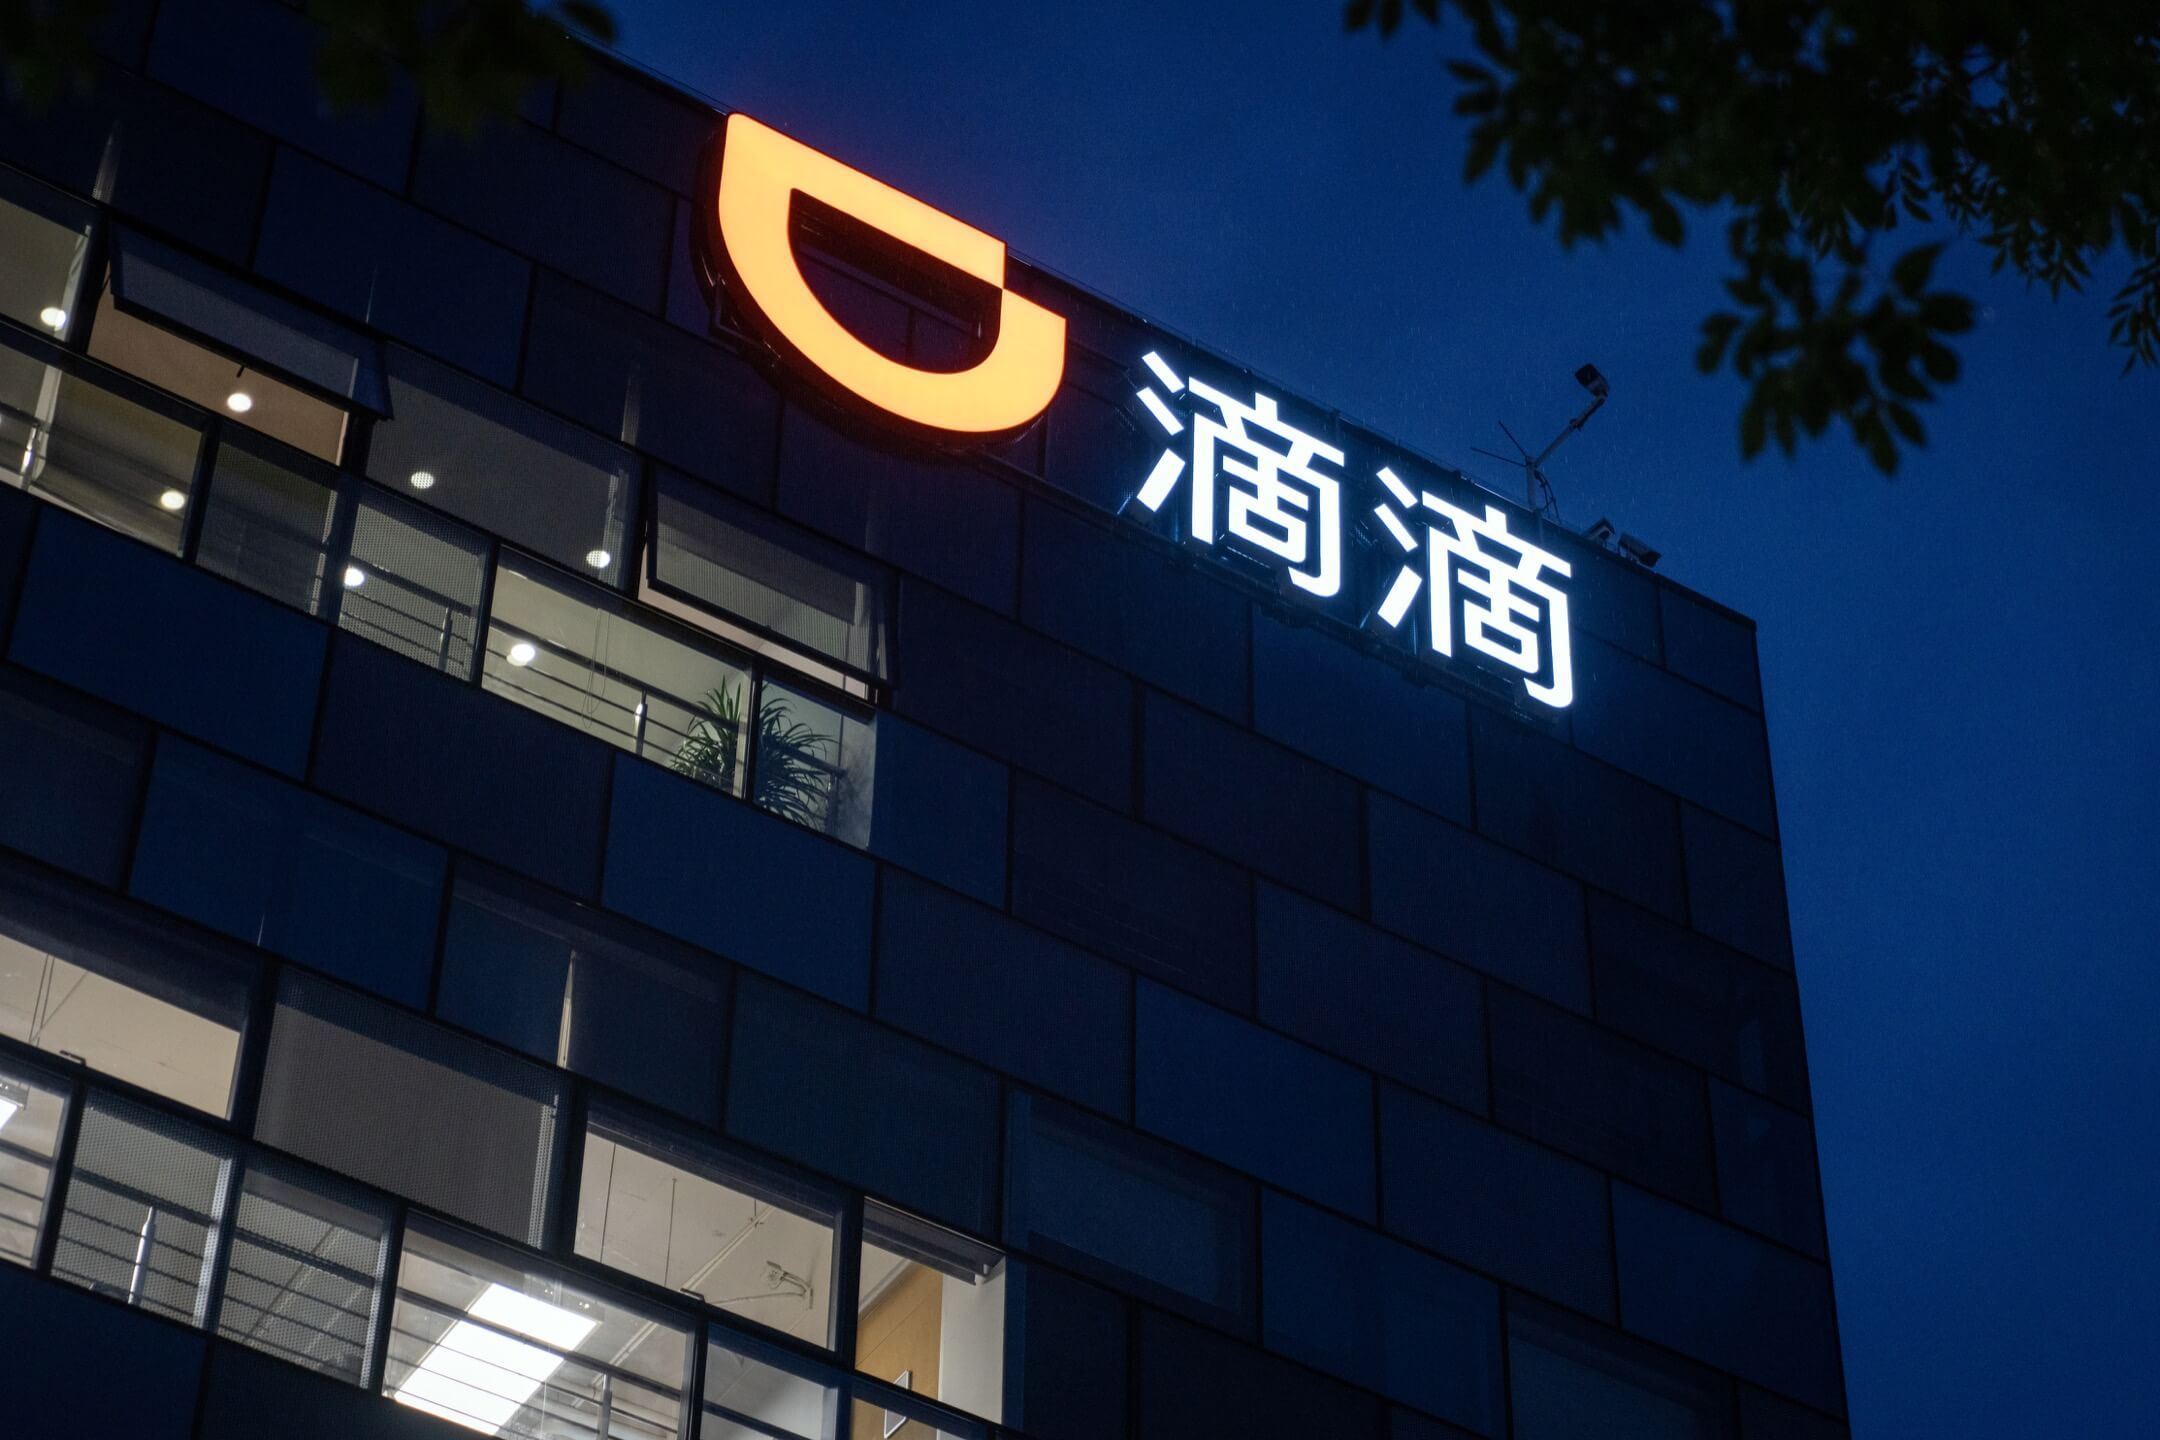 滴滴在北京的總部大樓。 攝:Yan Cong/Bloomberg via Getty Images